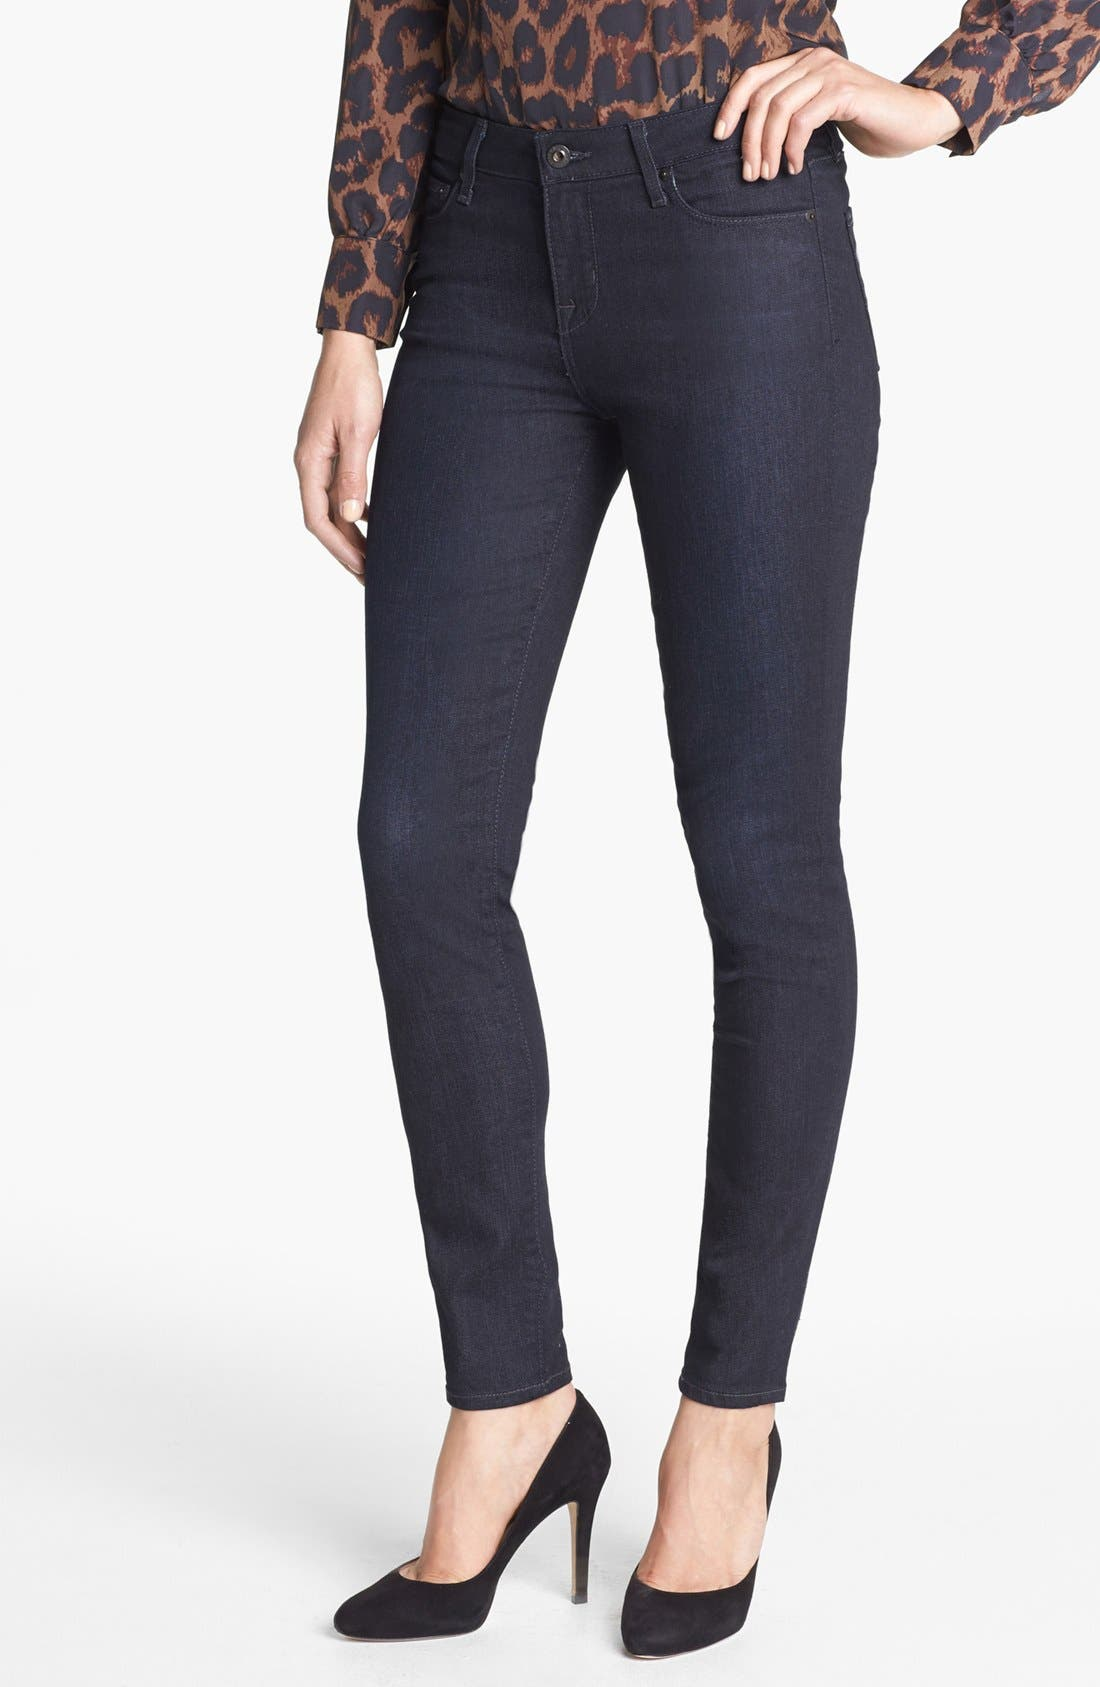 Alternate Image 1 Selected - Big Star 'Alex' Stretch Skinny Jeans (Avignon) (Petite)